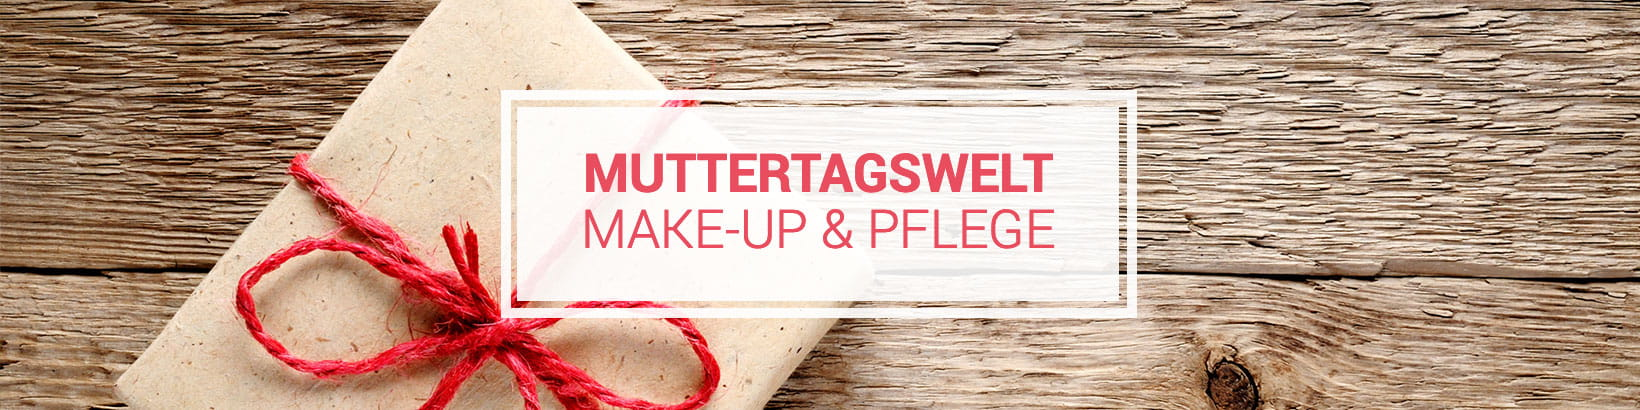 Visual-1640x410-Muttertag-Make-Up-Pflege